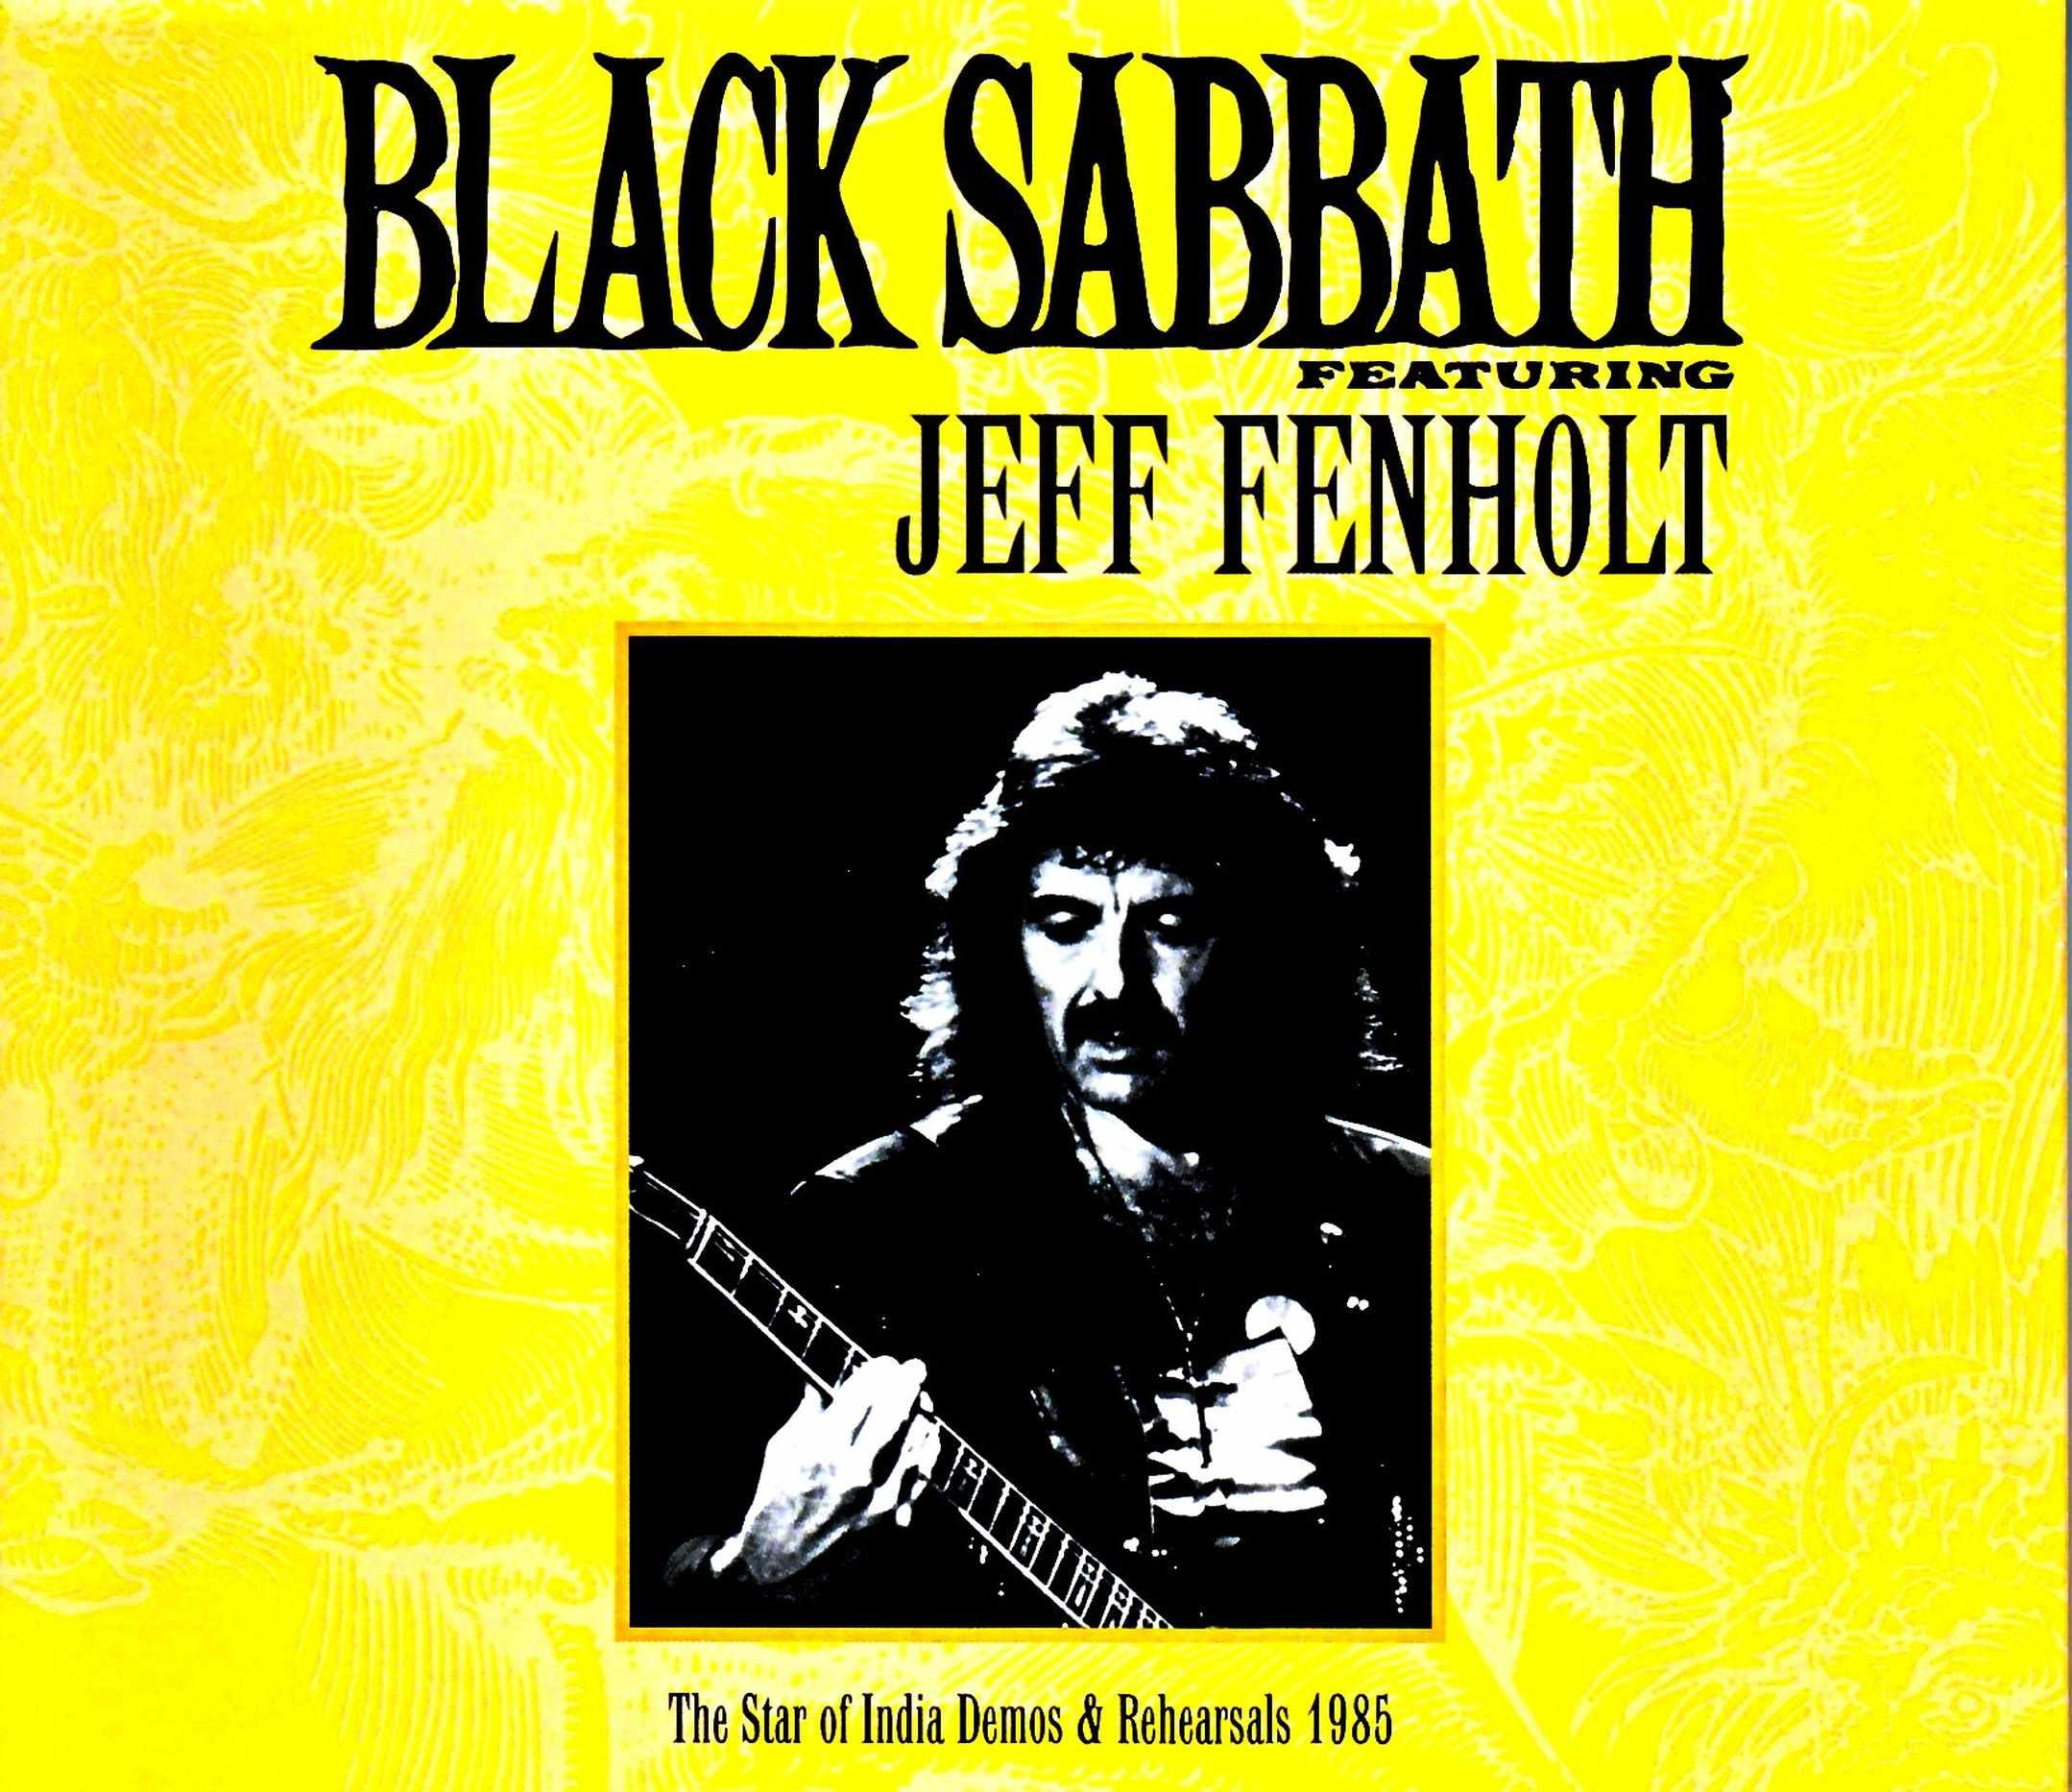 Black Sabbath,Jeff Fenholt ブラック・サバス/The Star of India Demos & Rehearsals 1985 Version 2